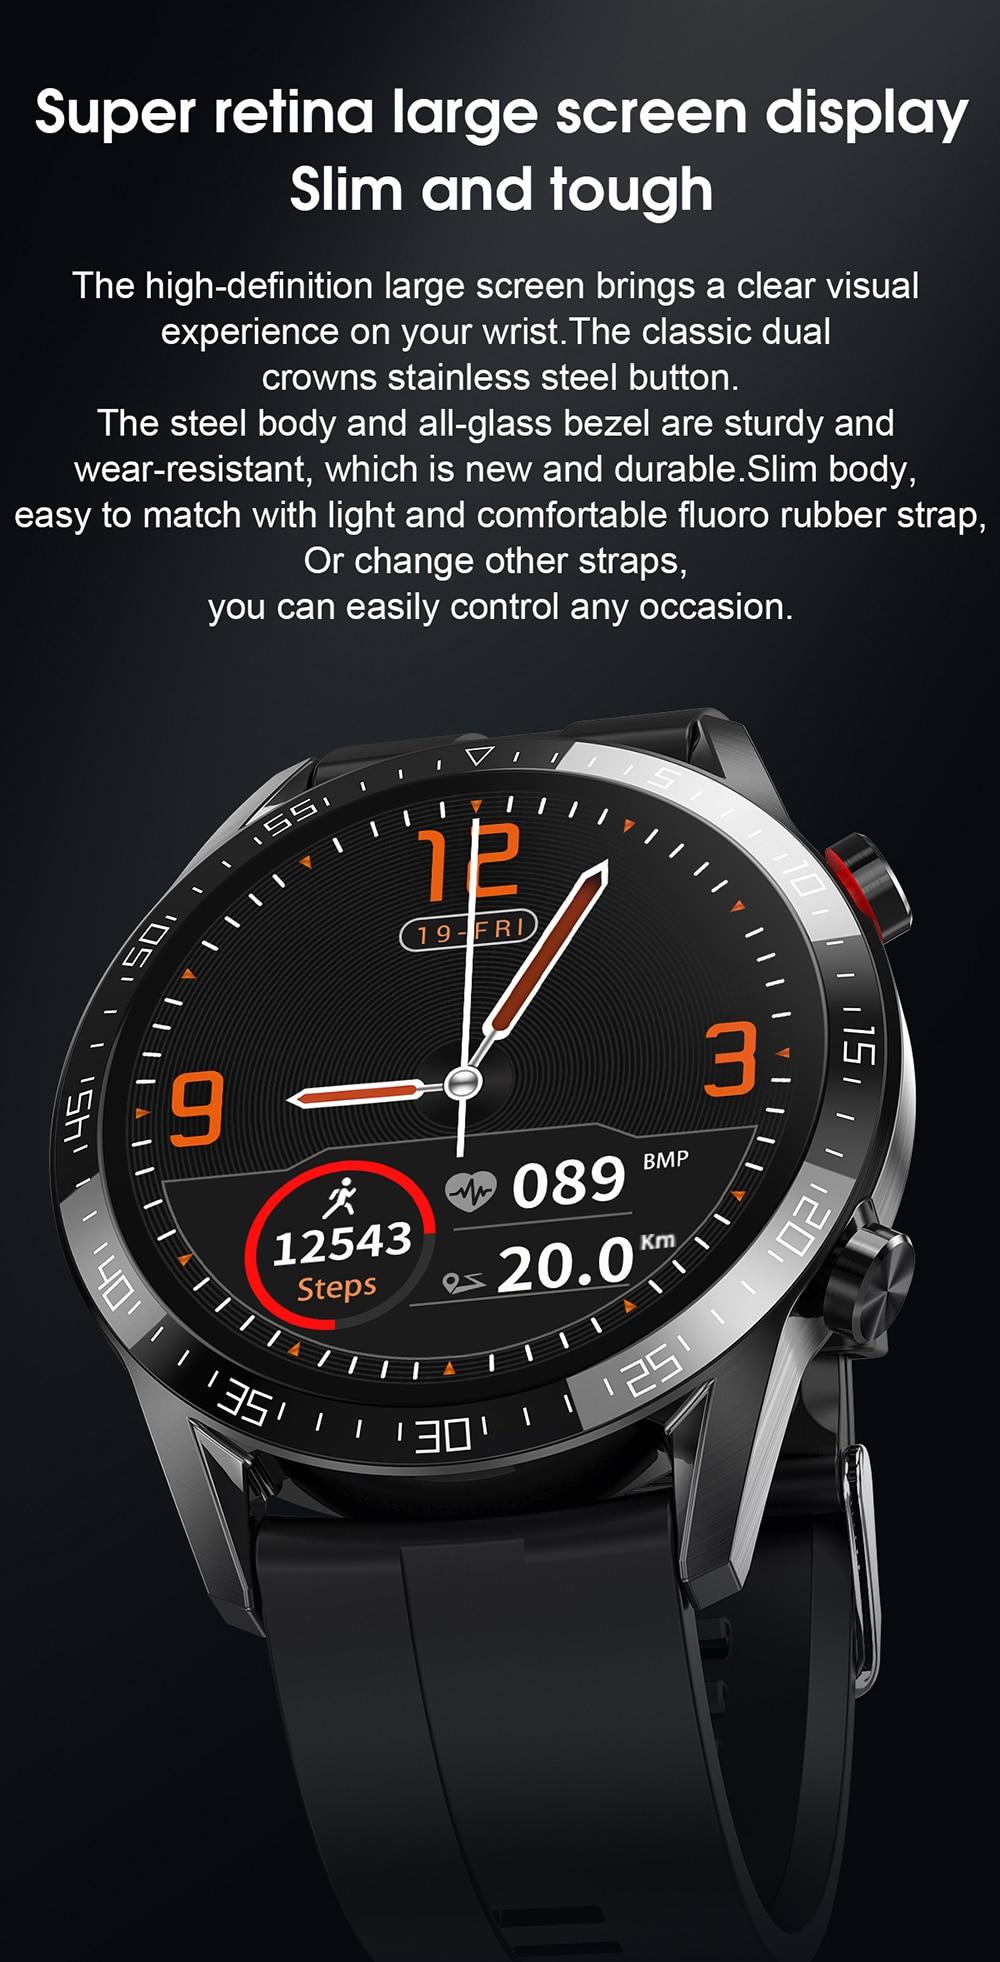 Hdf85e0d3376a48c68c4d7618821b69cdt For Phone Xiaomi Android IOS Reloj Inteligente Hombre Smartwatch Men 2021 Android IP68 Smartwatch Answer Call Smart Watch Man